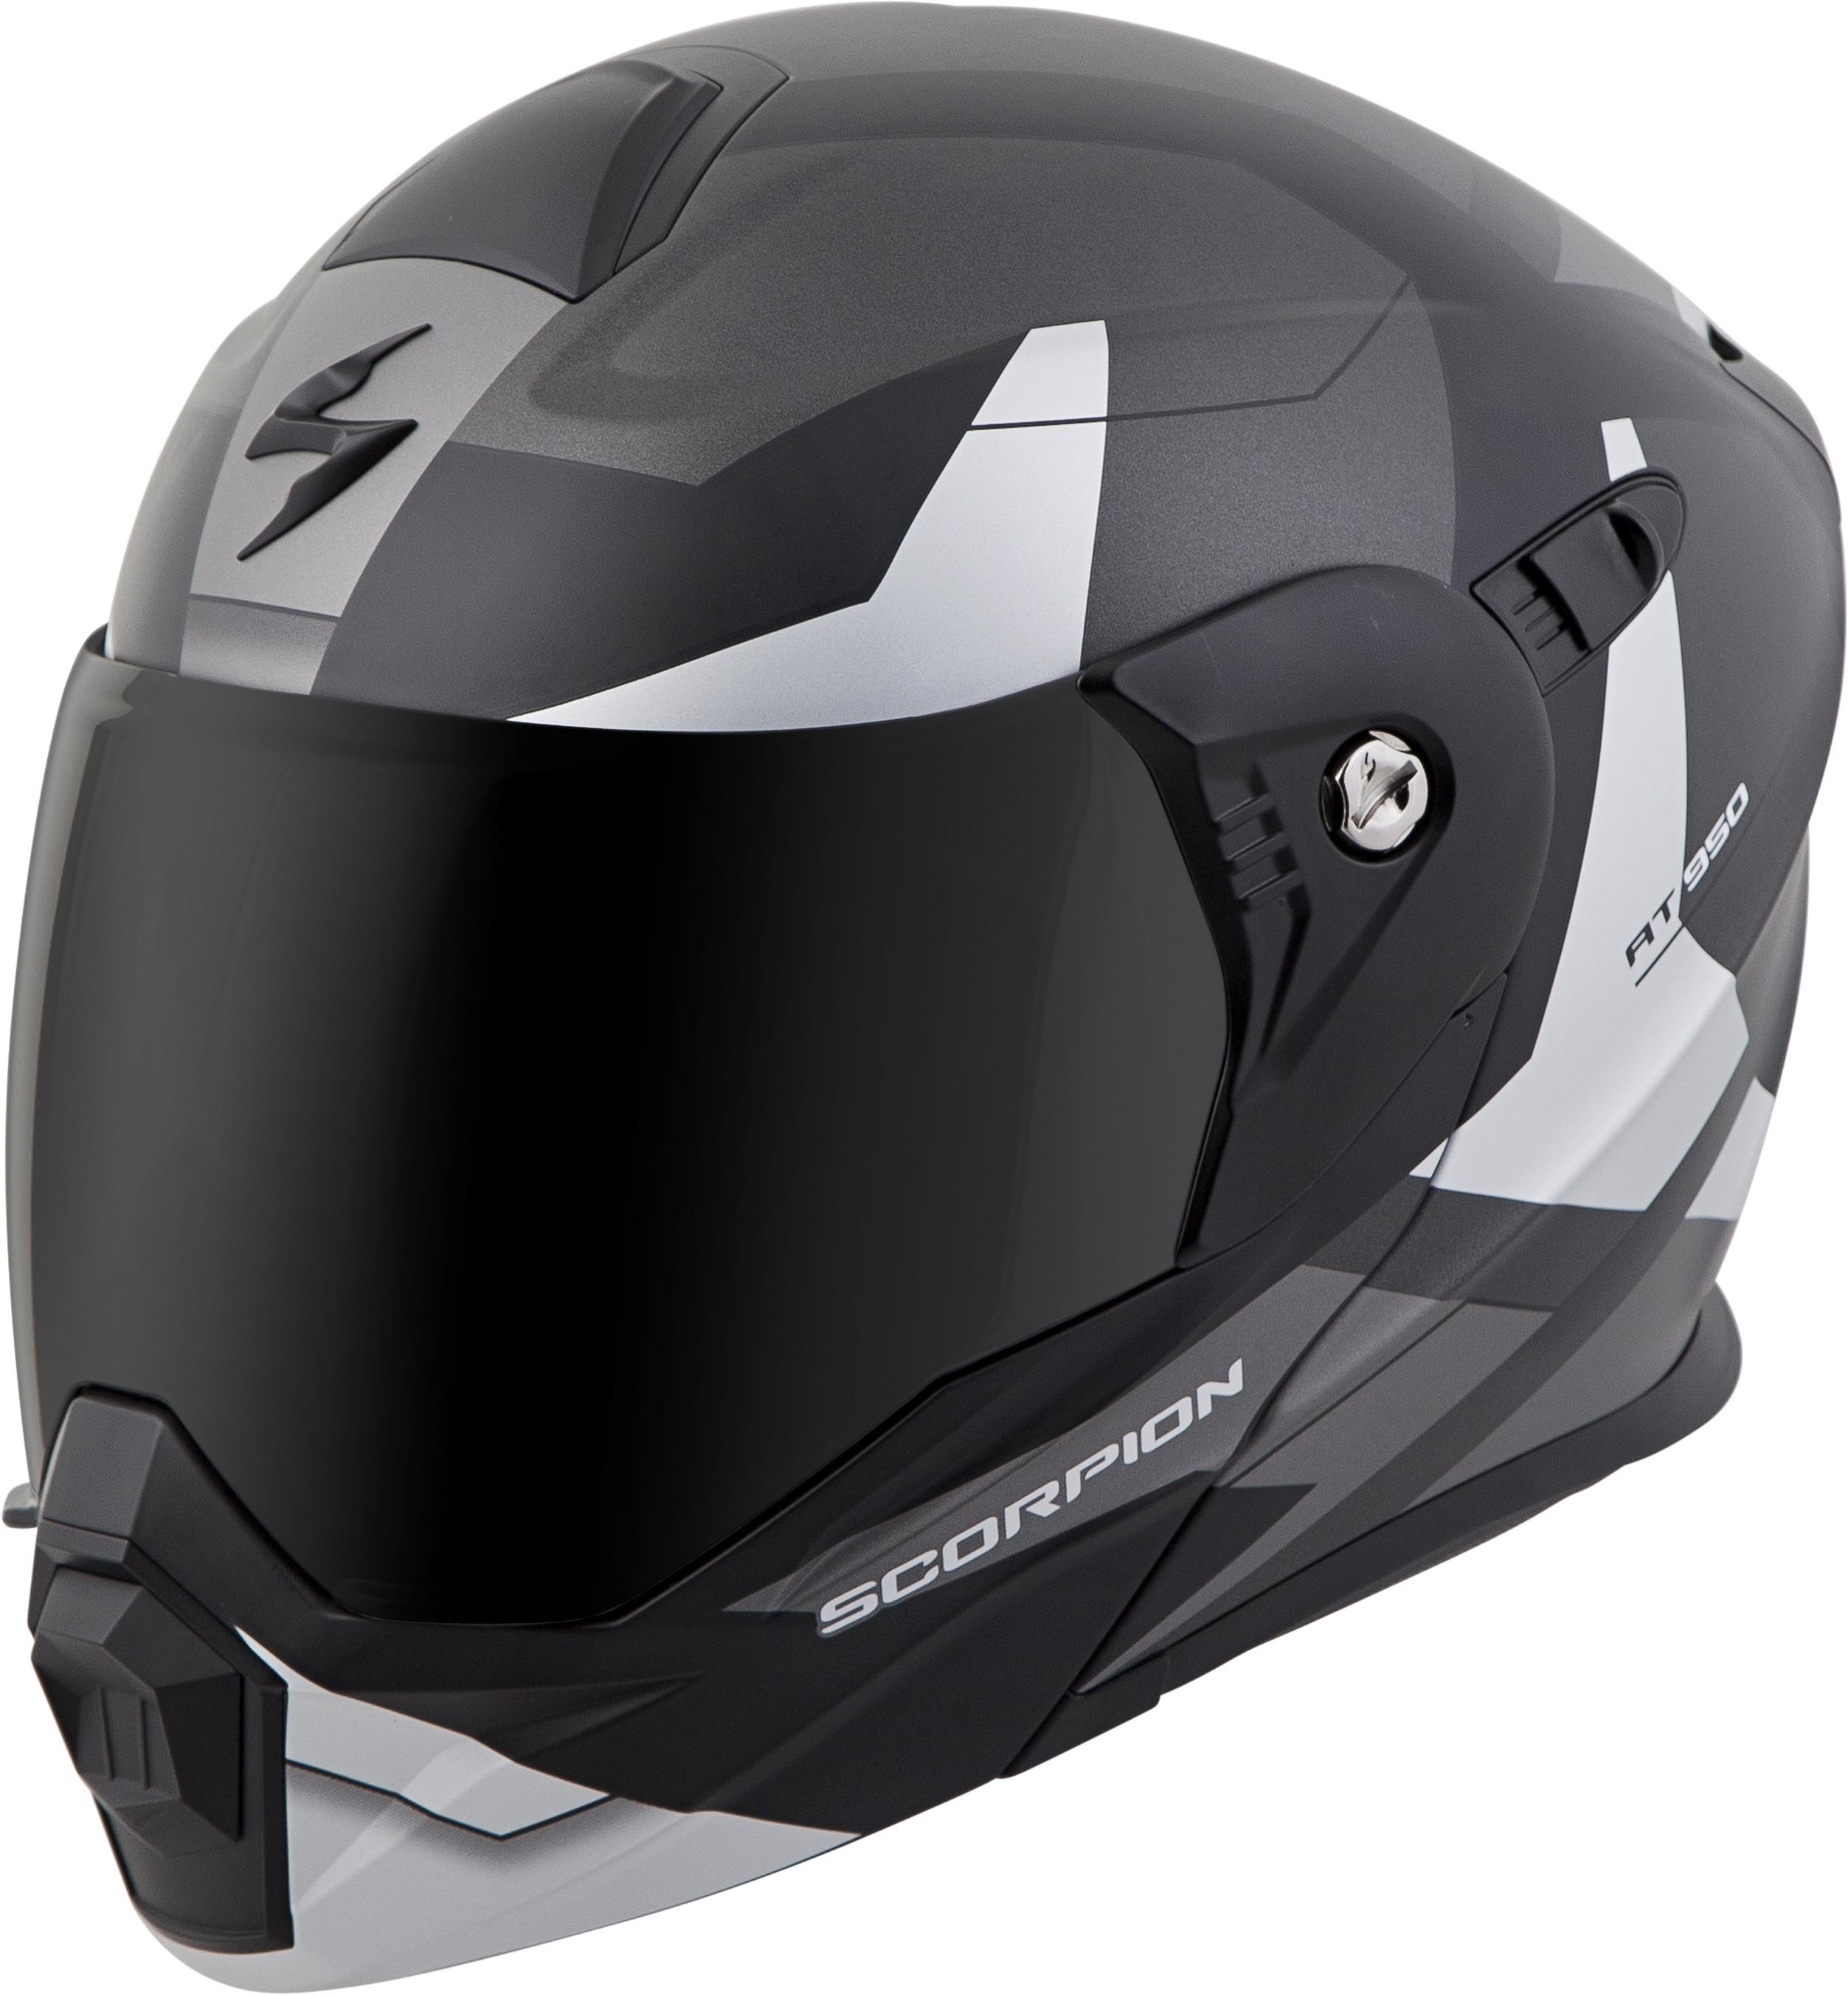 for-Scorpion-Helmet-EXO-AT950-Neocon-Snow-Helmet-with-Dual-Lens-Shield miniature 26